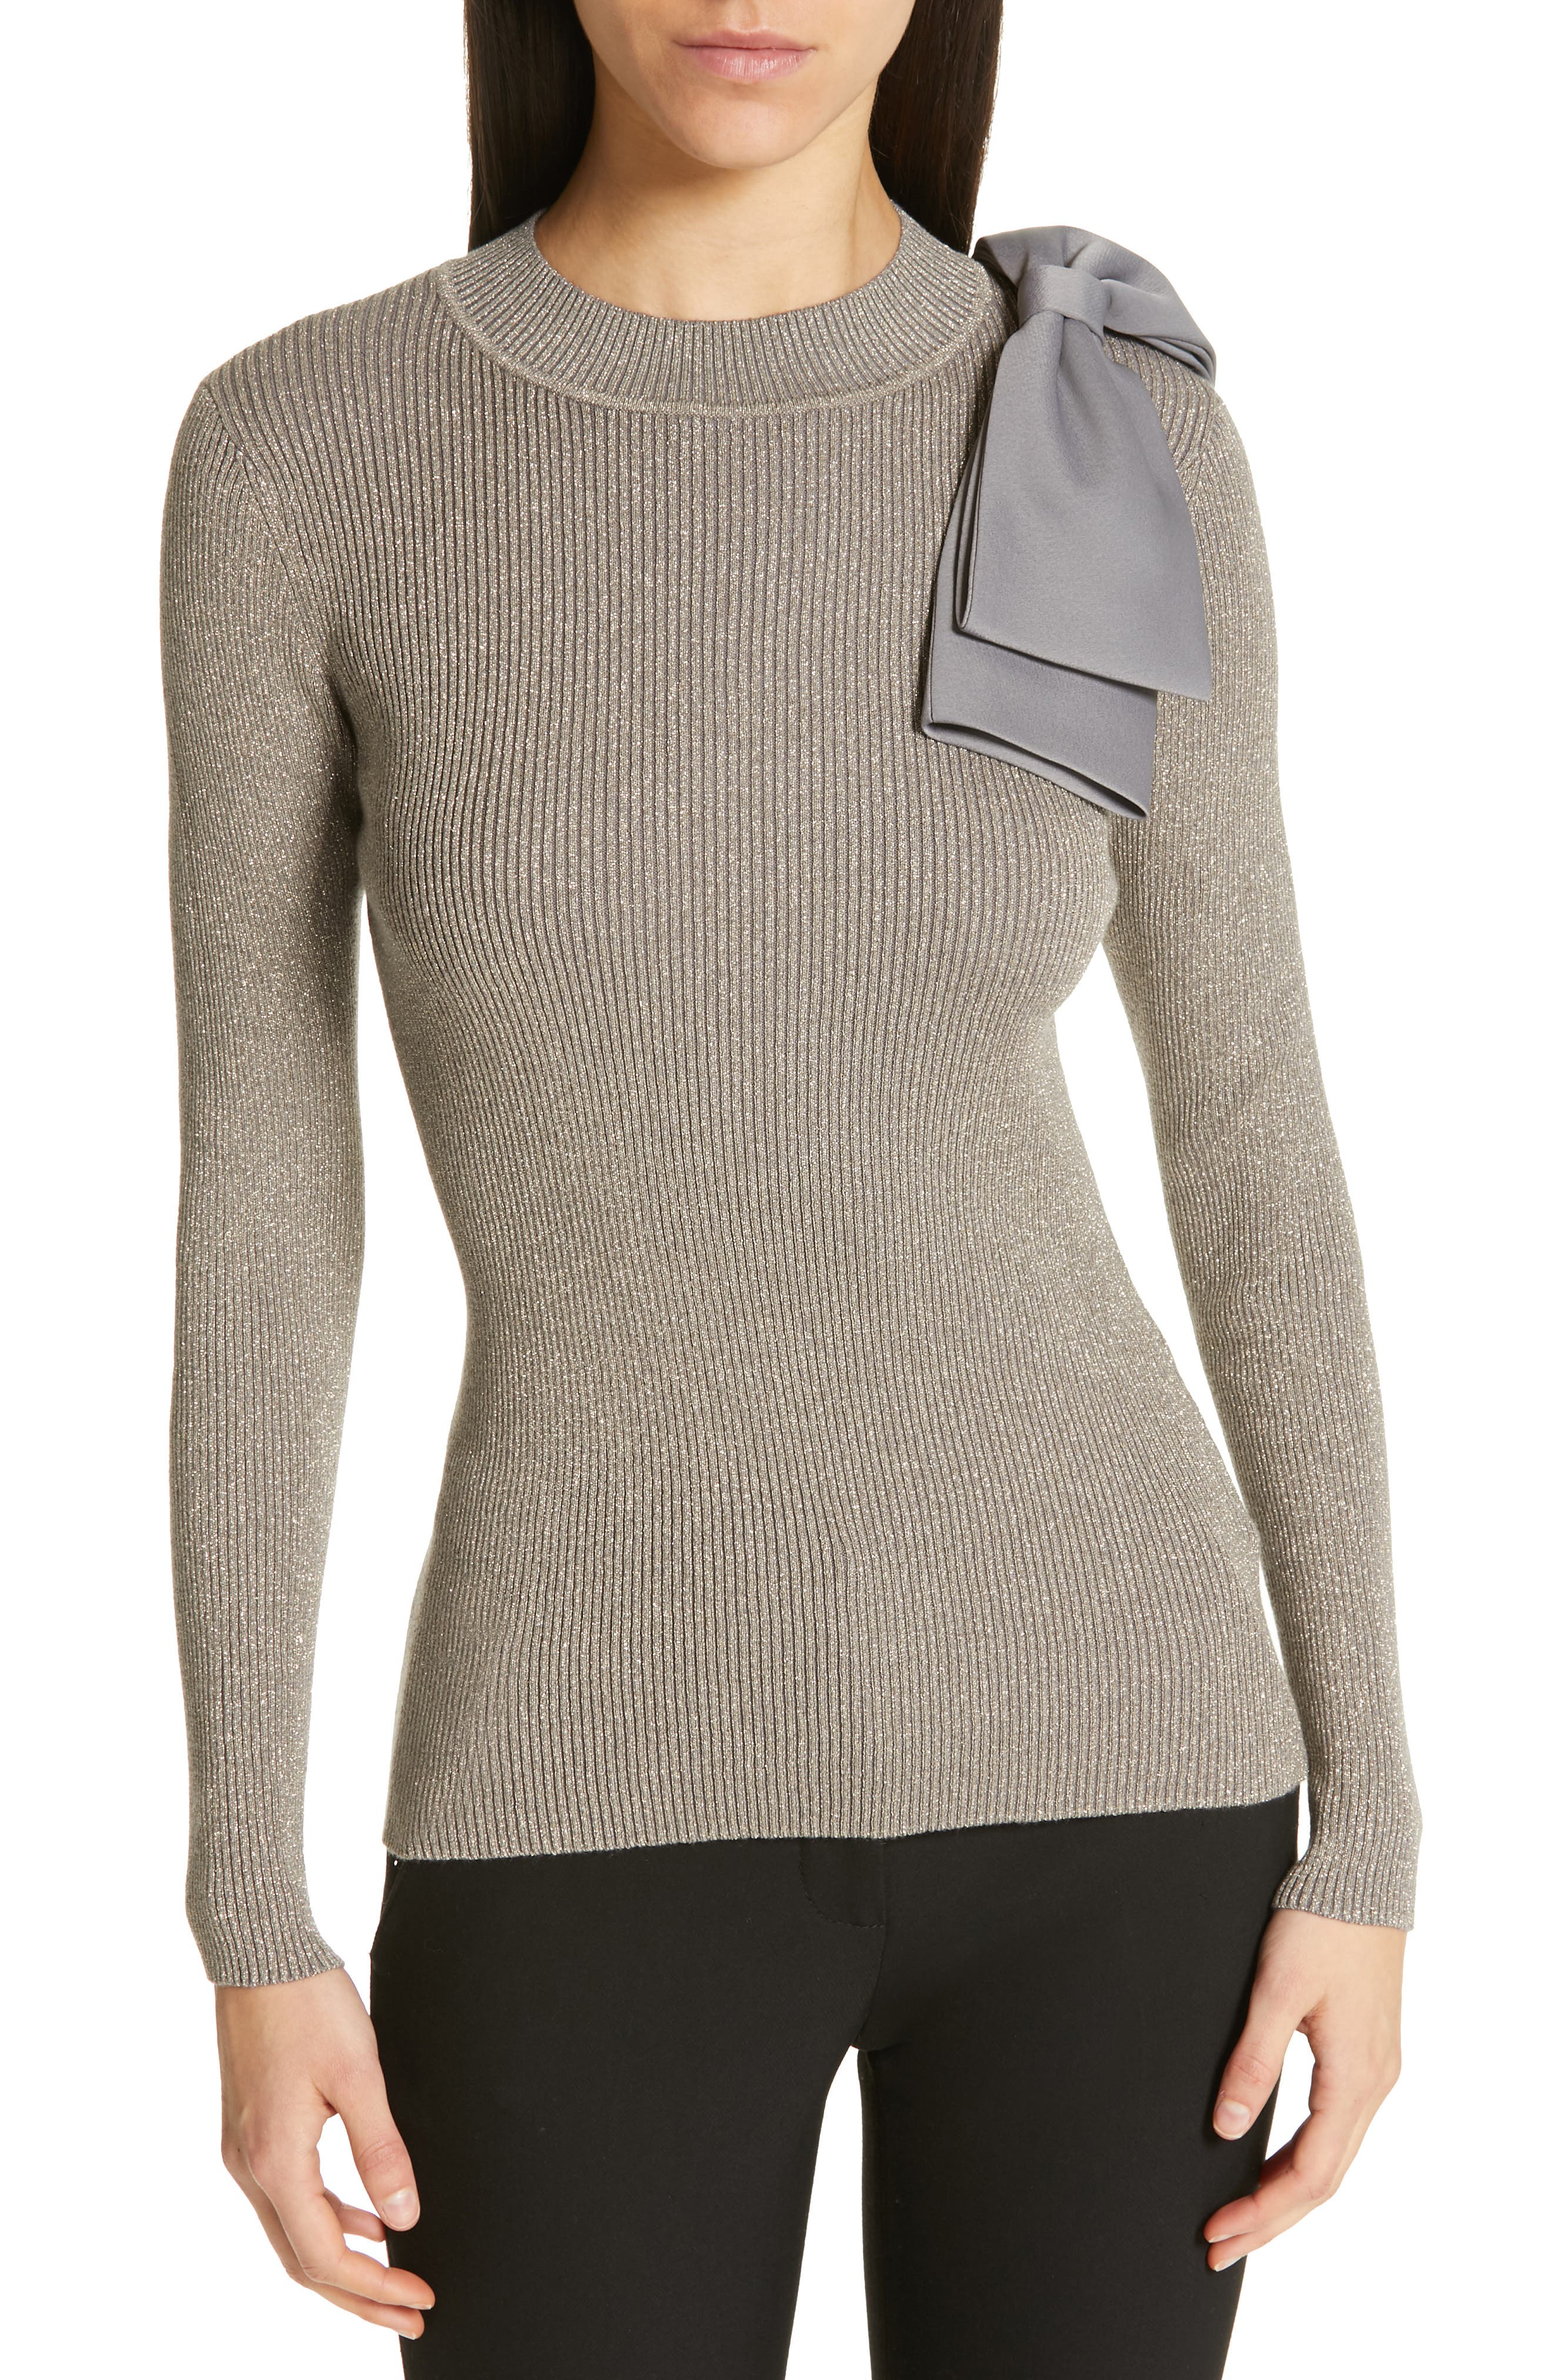 Saaydie Bow Trim Metallic Sweater,                         Main,                         color, CHARCOAL